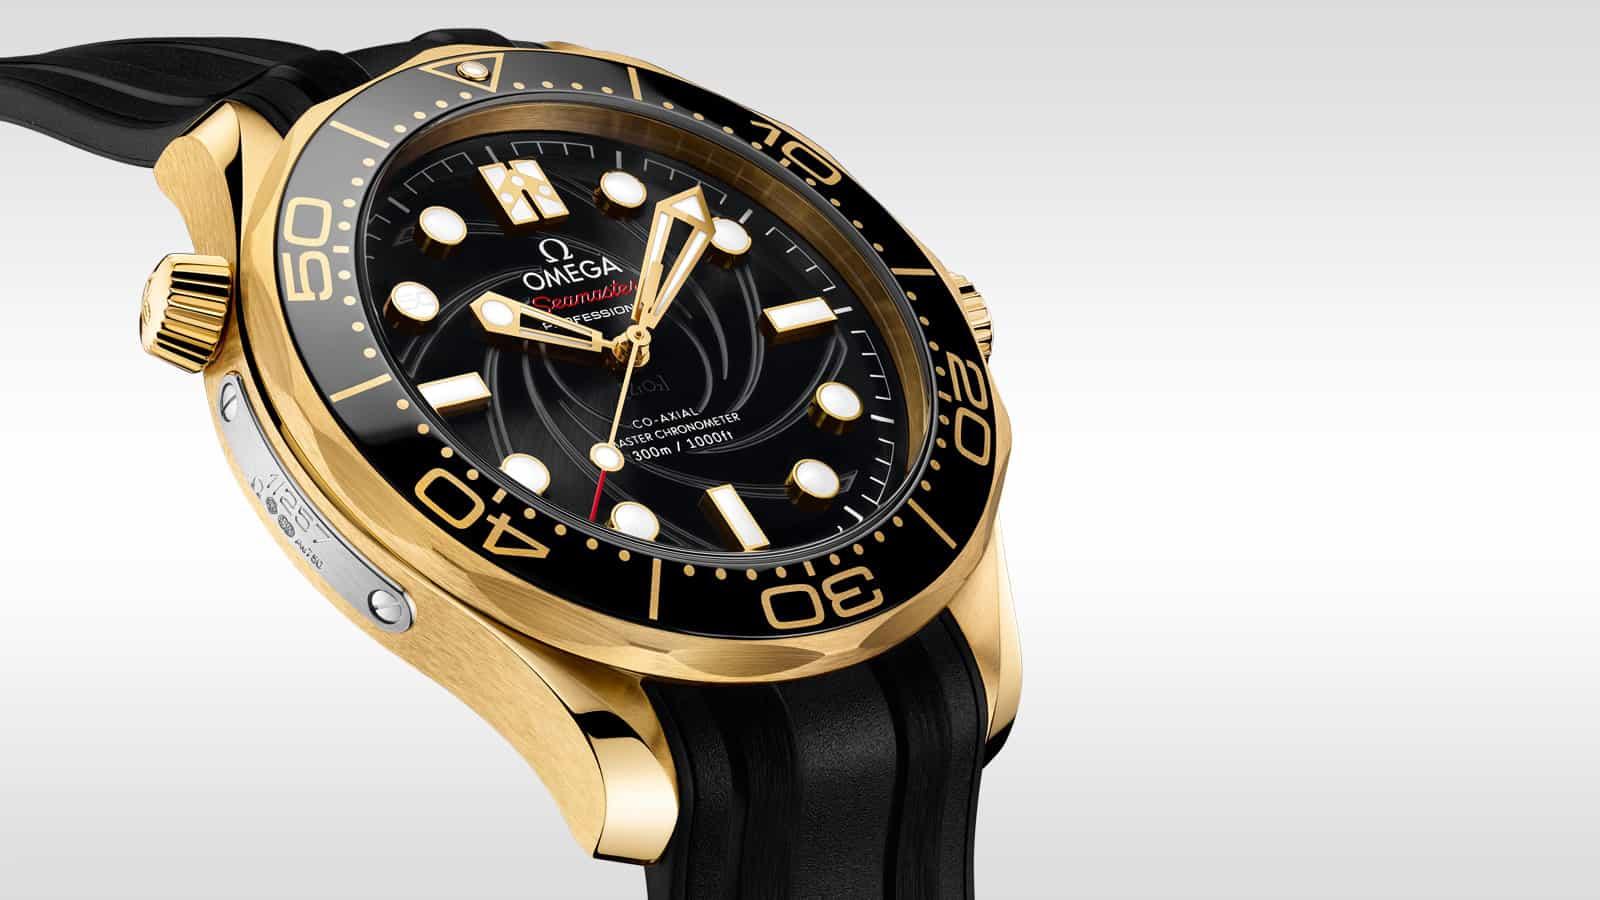 omega seamaster james bond 42 limitedomega seamaster james bond 42 limited